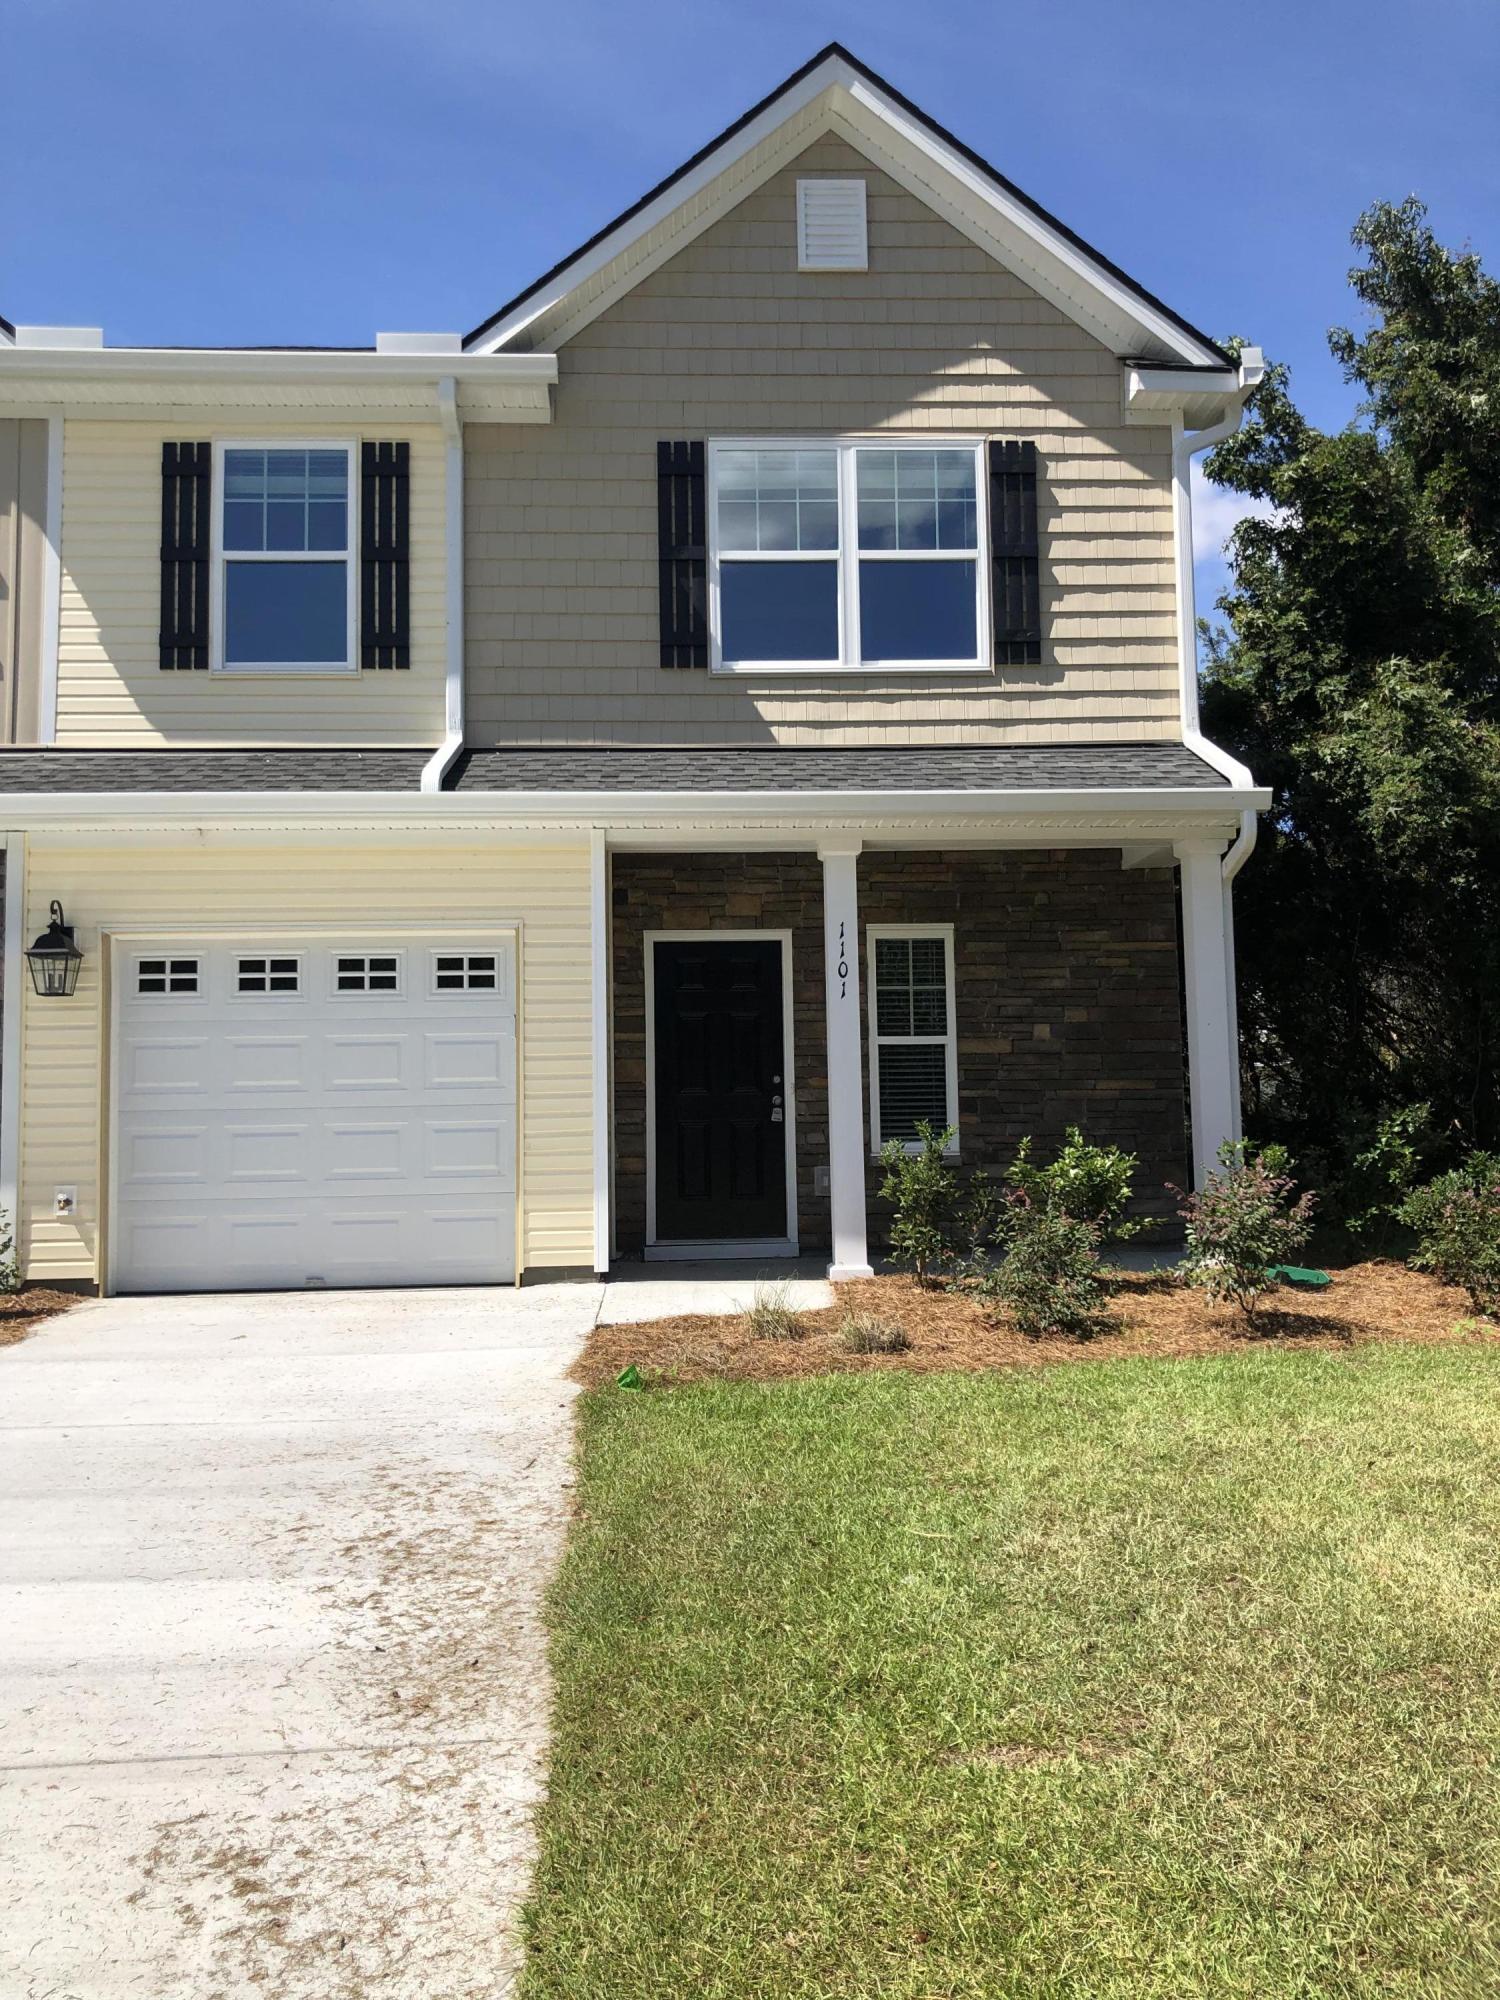 Fenwick Commons Homes For Sale - 1101 Santa Elena, Johns Island, SC - 5